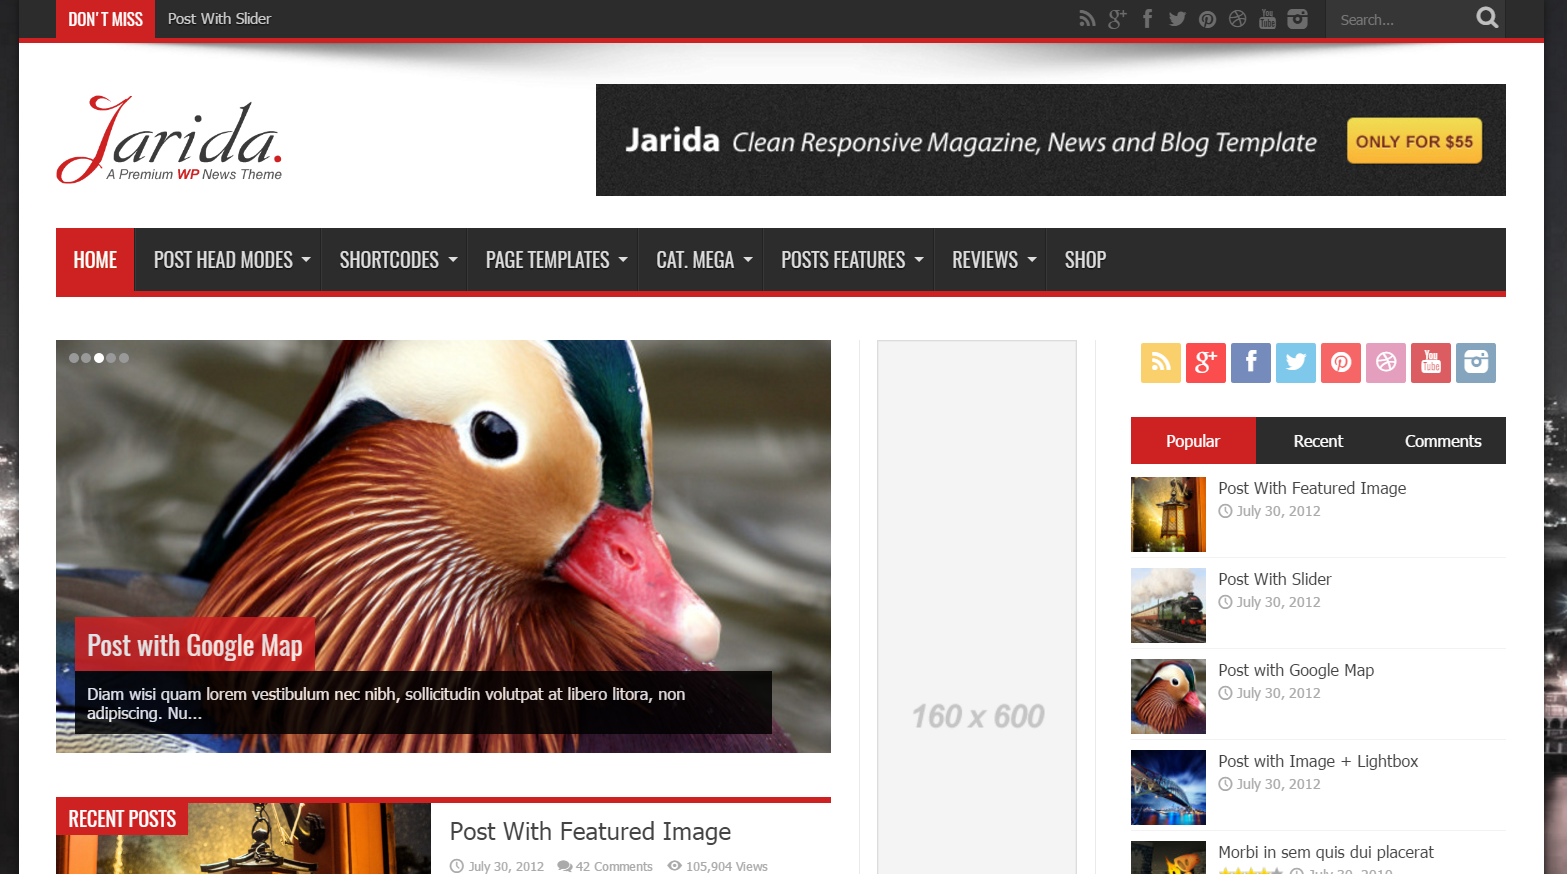 Wordpress site greenmediaitcom uses the greenigma best wordpress theme greenigma best wordpress theme by weblizar